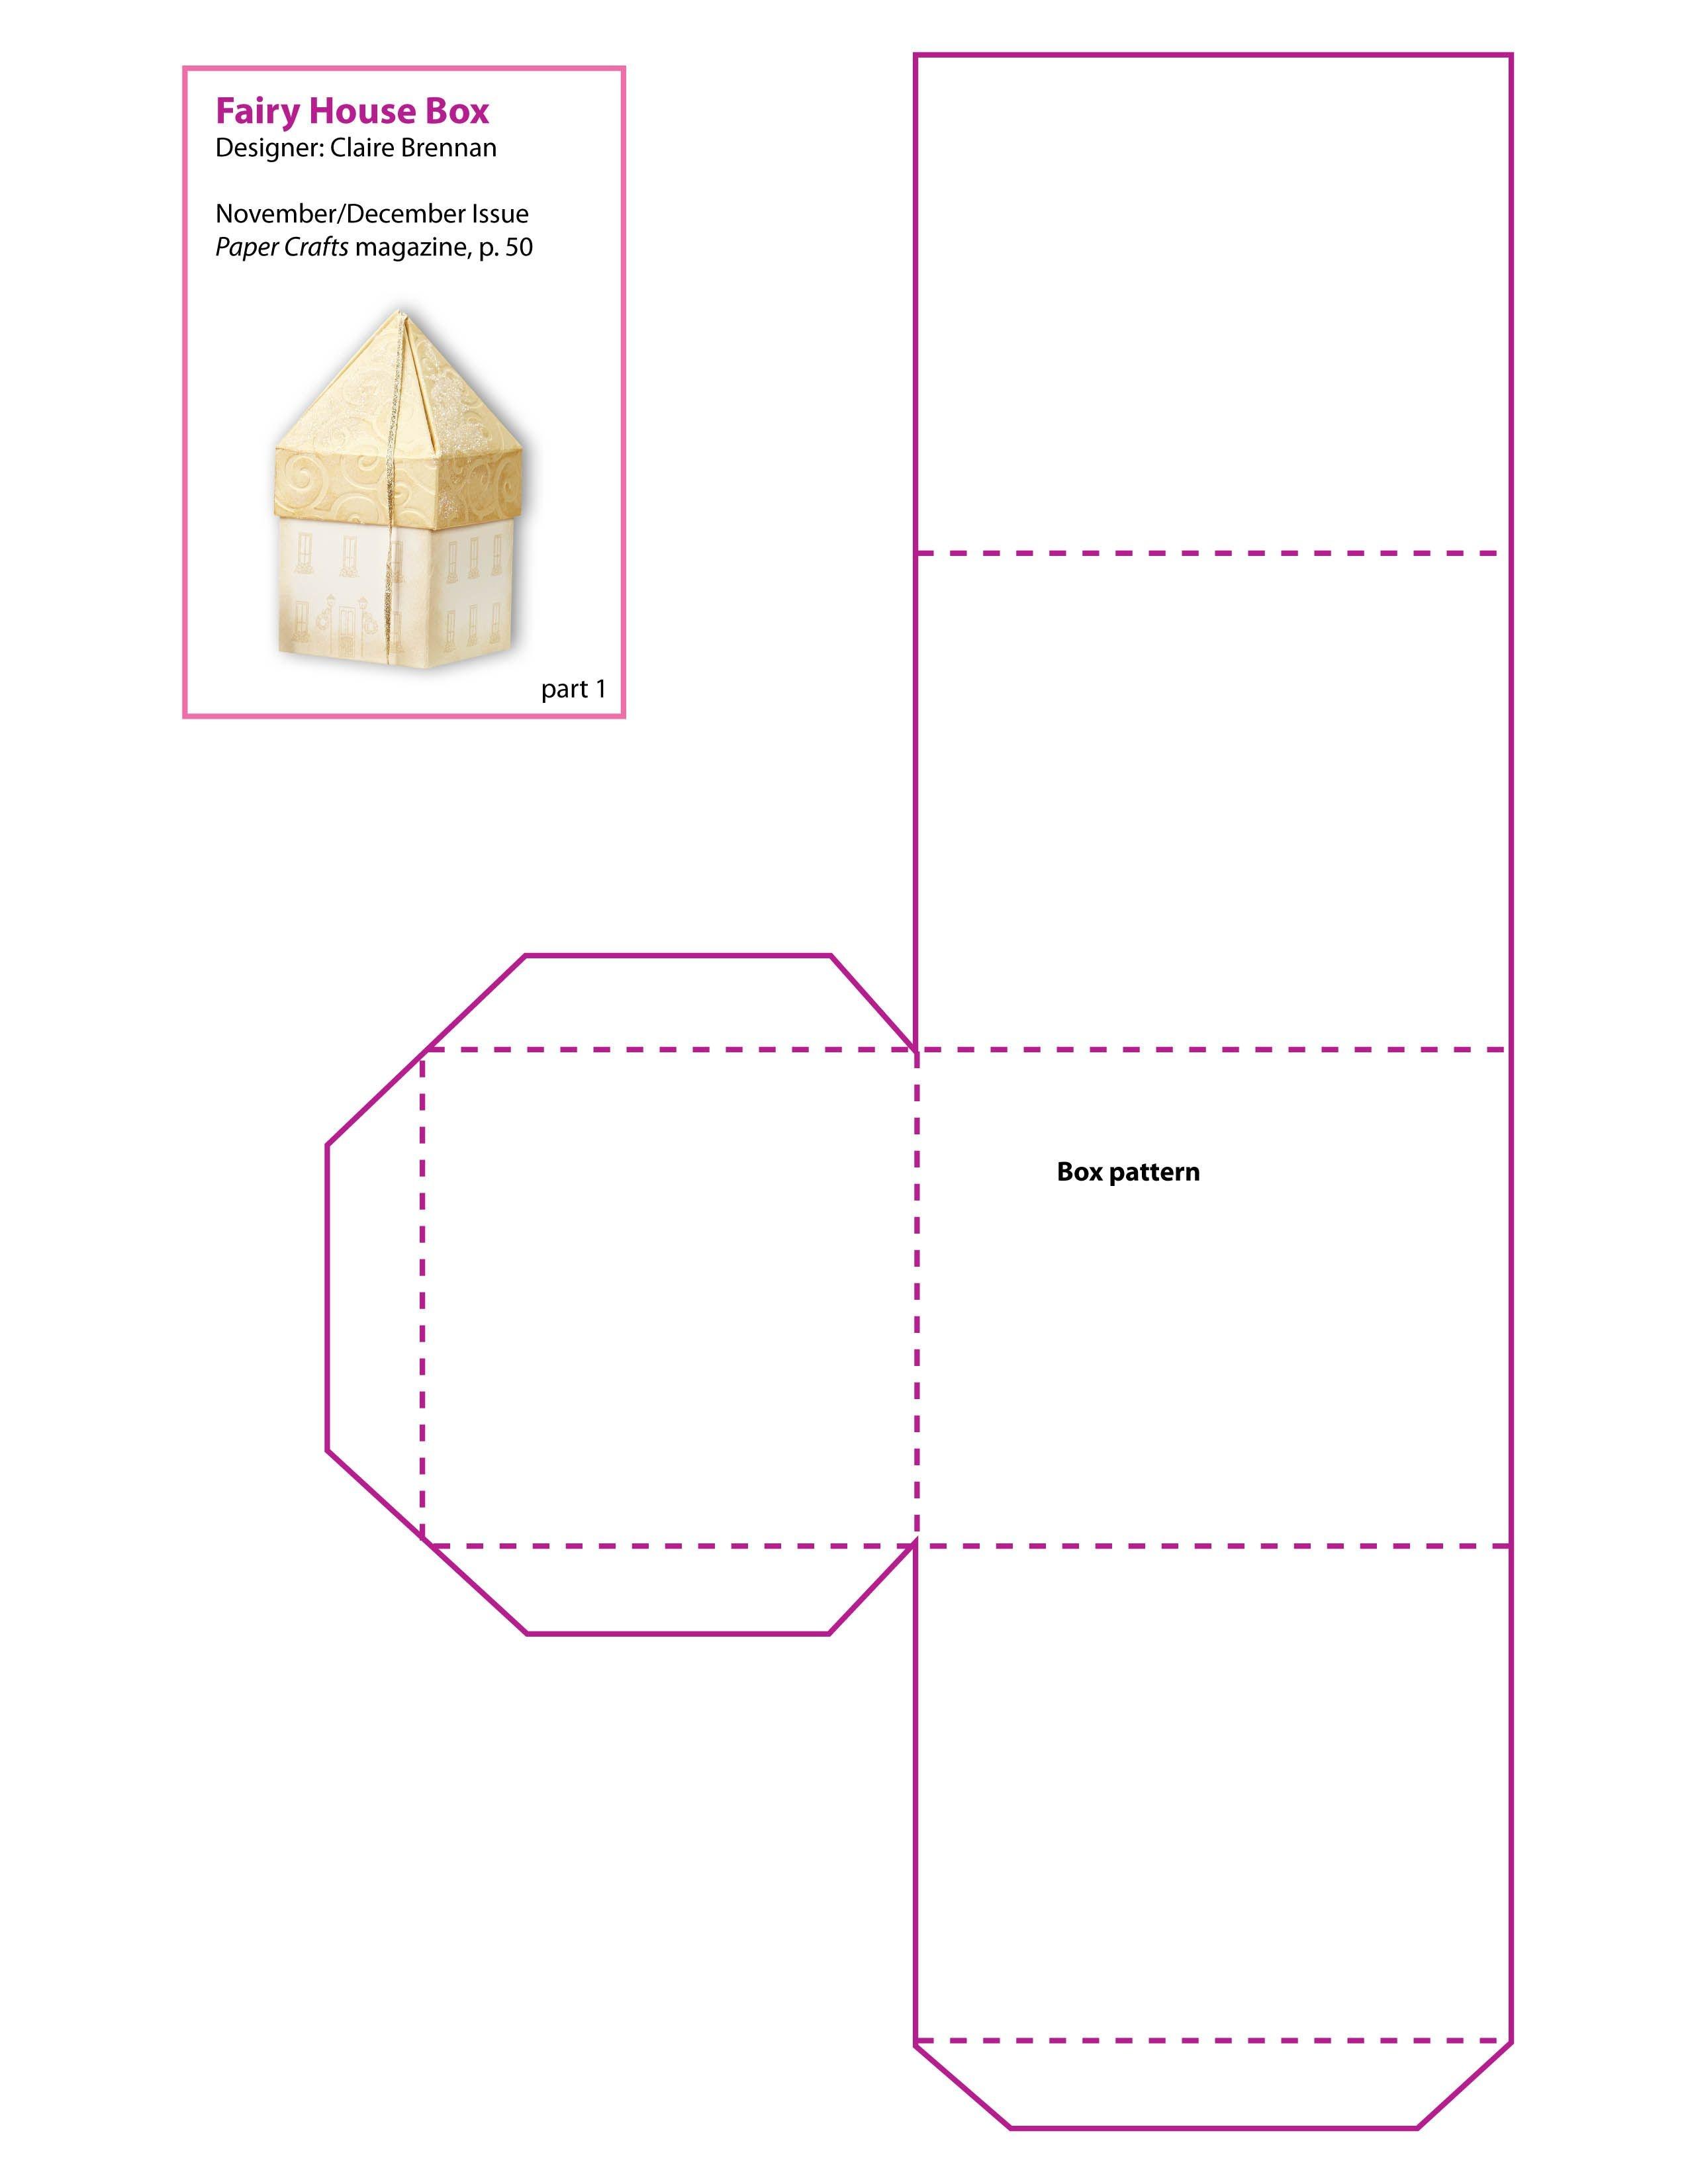 Free Printable Boxes Patterns | Free Printable Scrapbook Pages,print - Free Printable Box Patterns